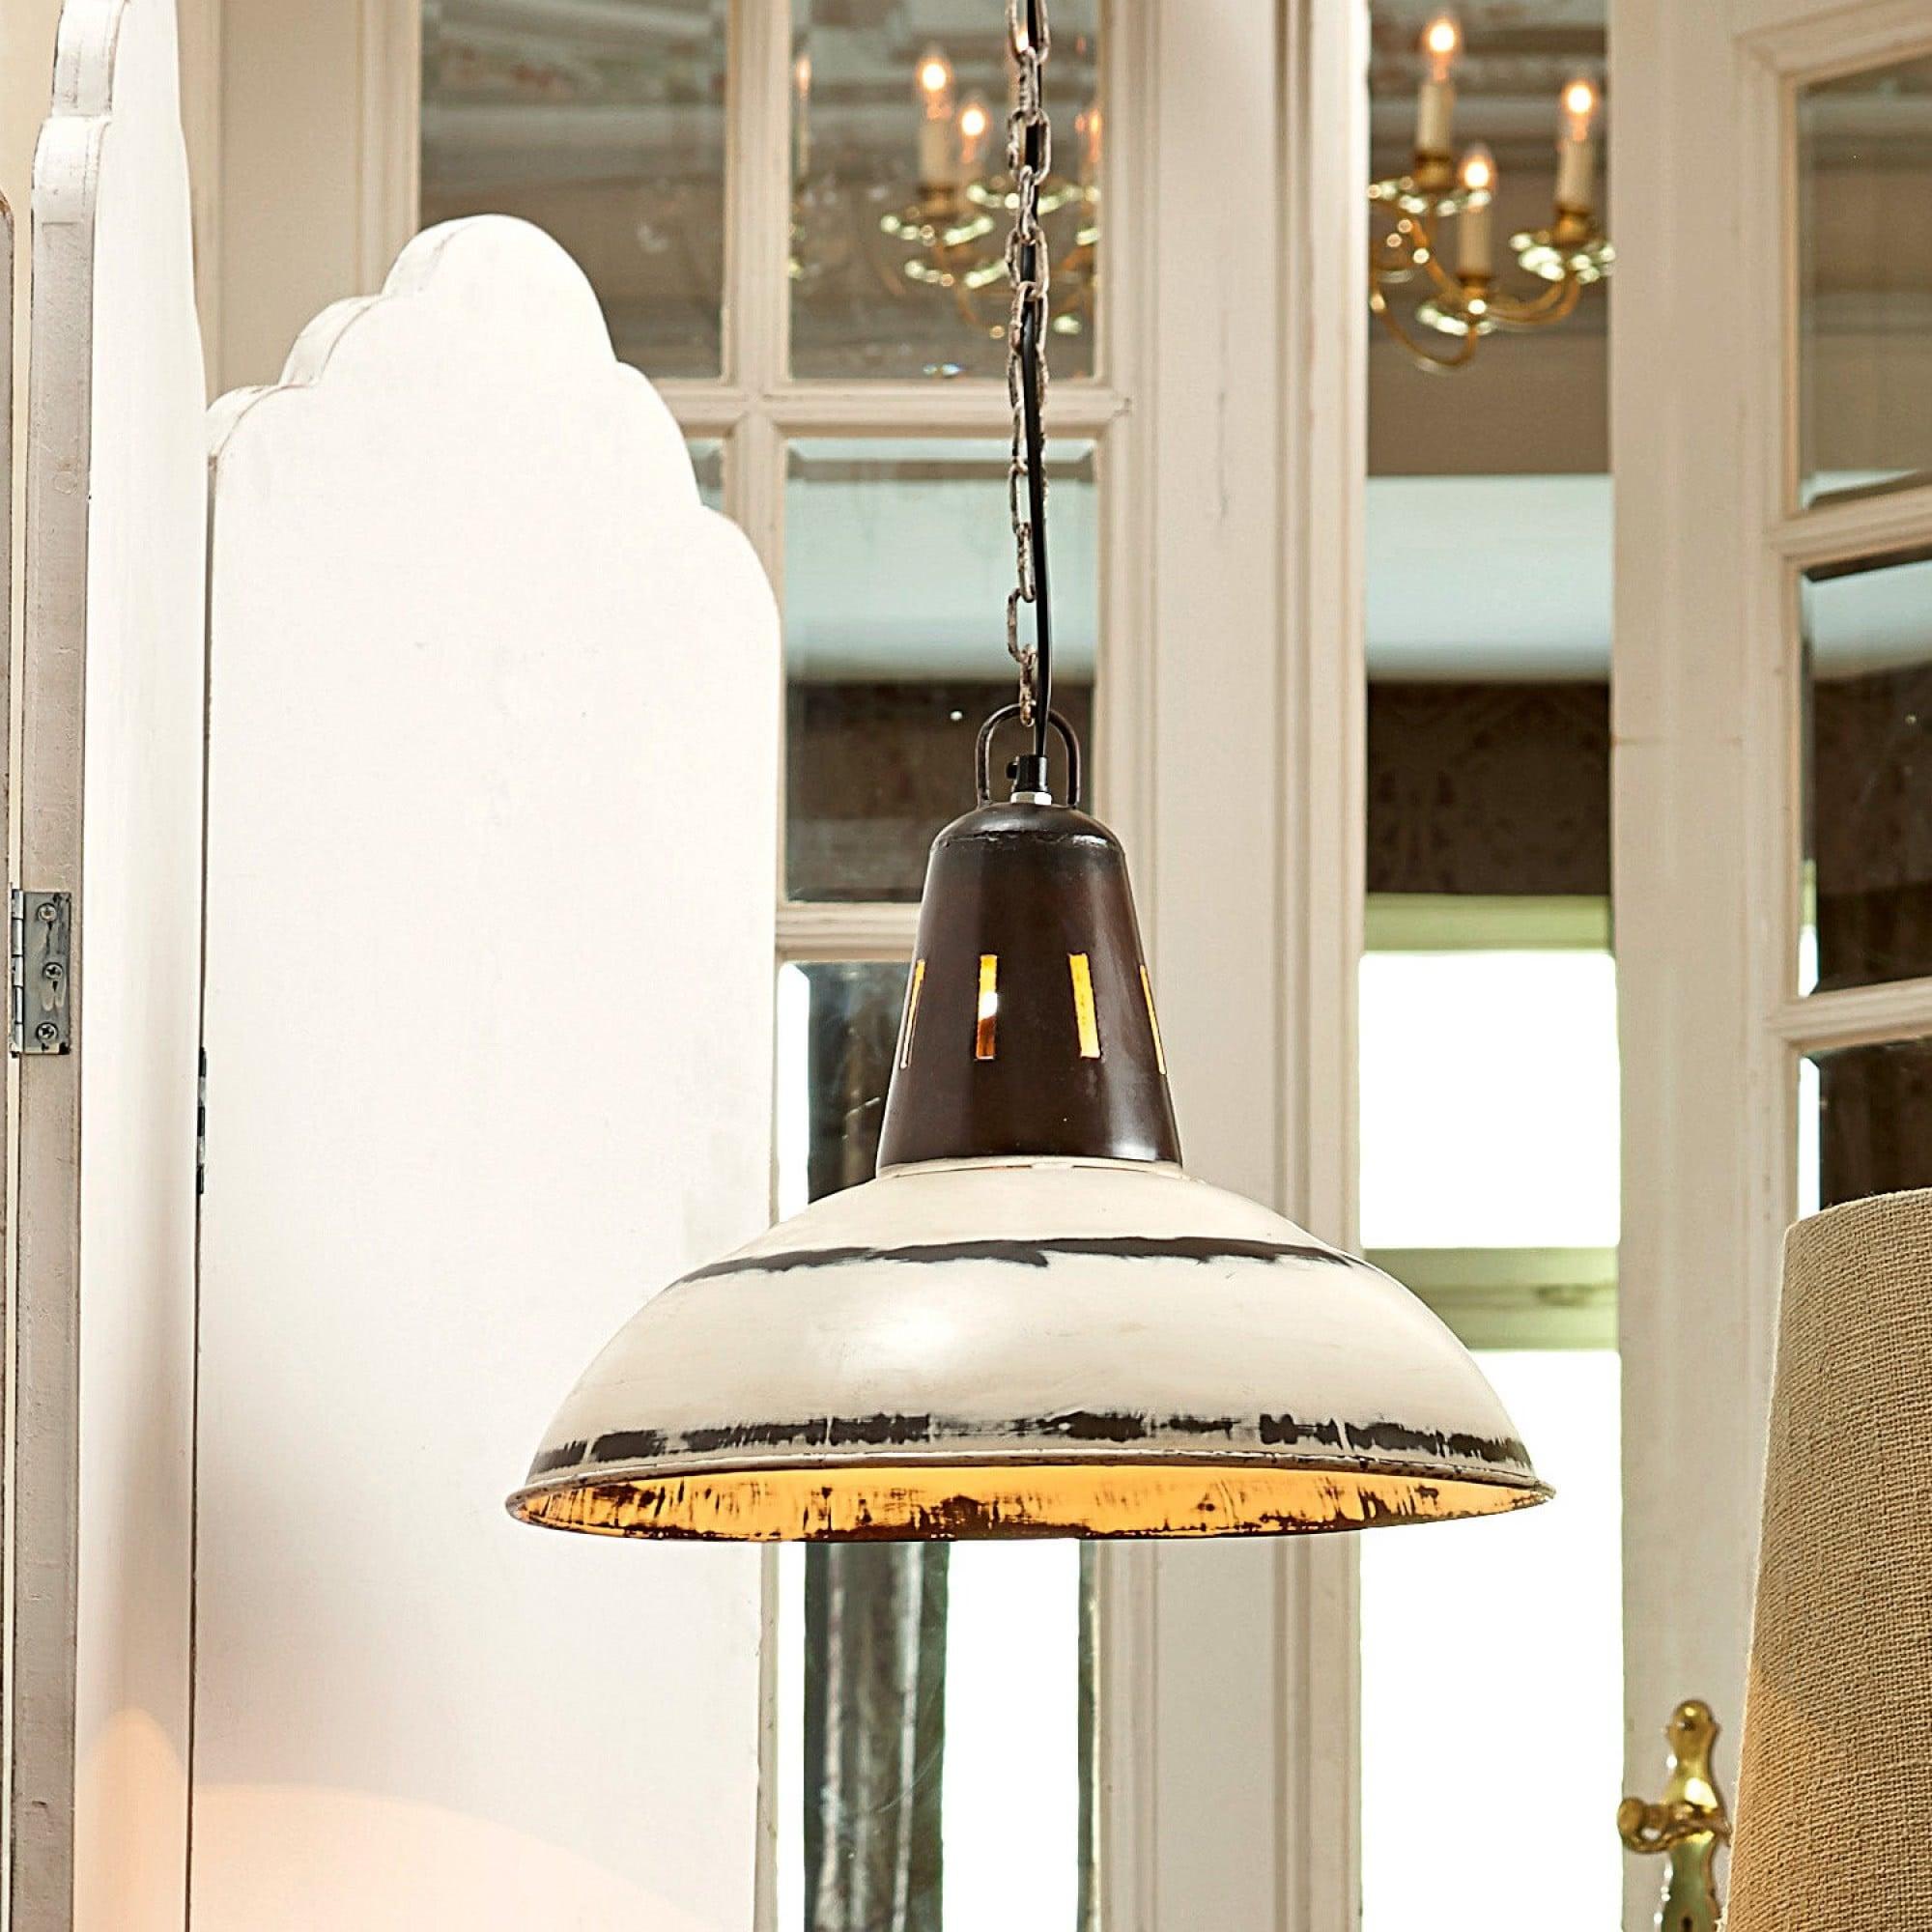 h ngelampe dukes loberon coming home. Black Bedroom Furniture Sets. Home Design Ideas